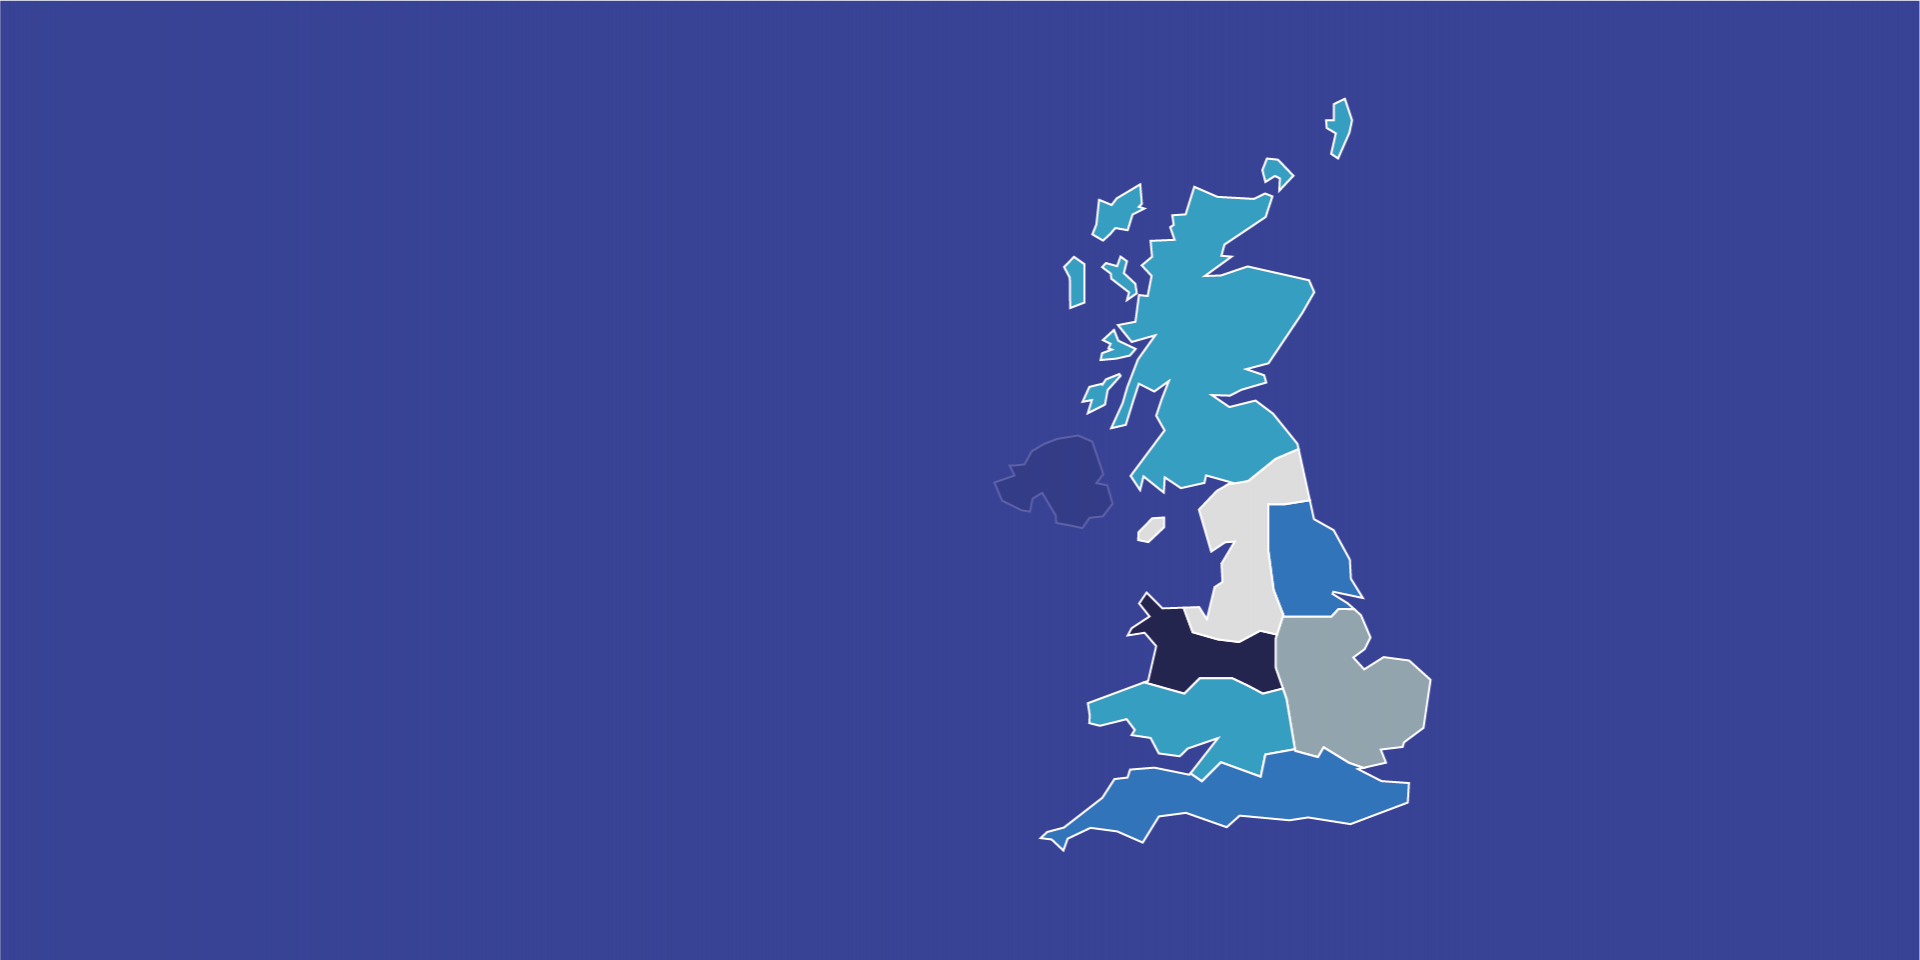 UK Region Sales Map